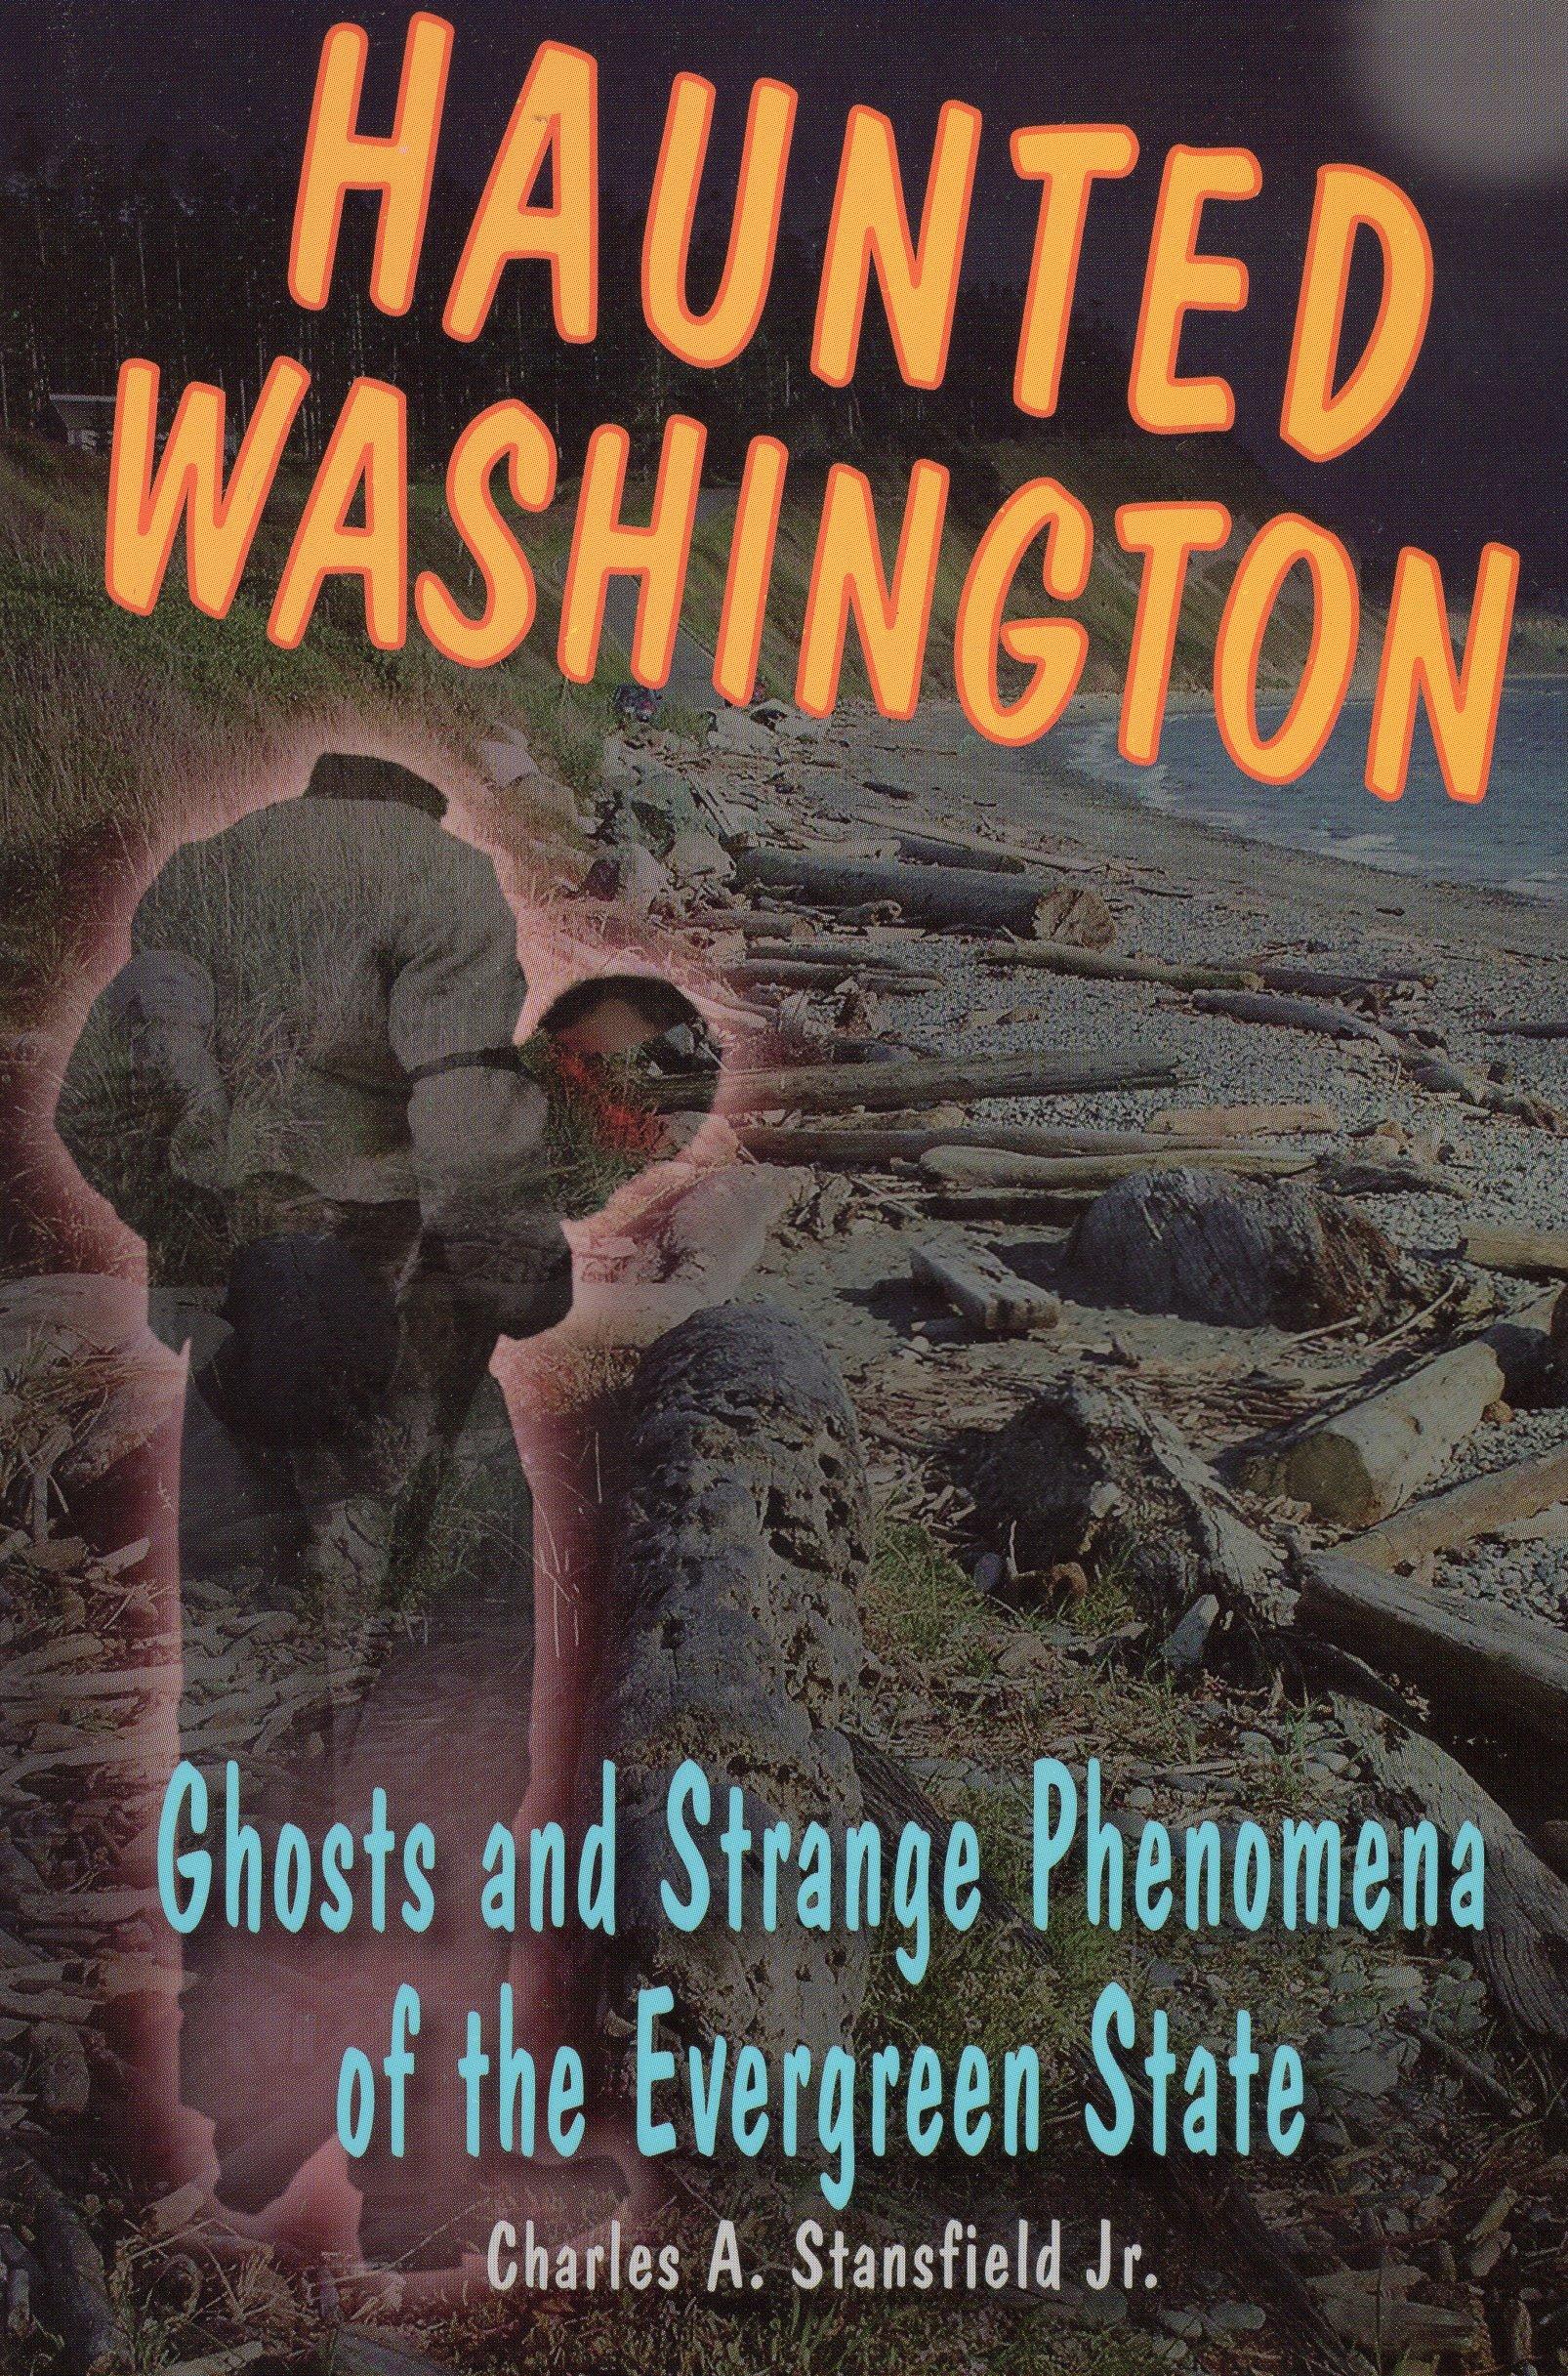 Haunted Washington: Ghosts and Strange Phenomena of the Evergreen State (Haunted Series) pdf epub